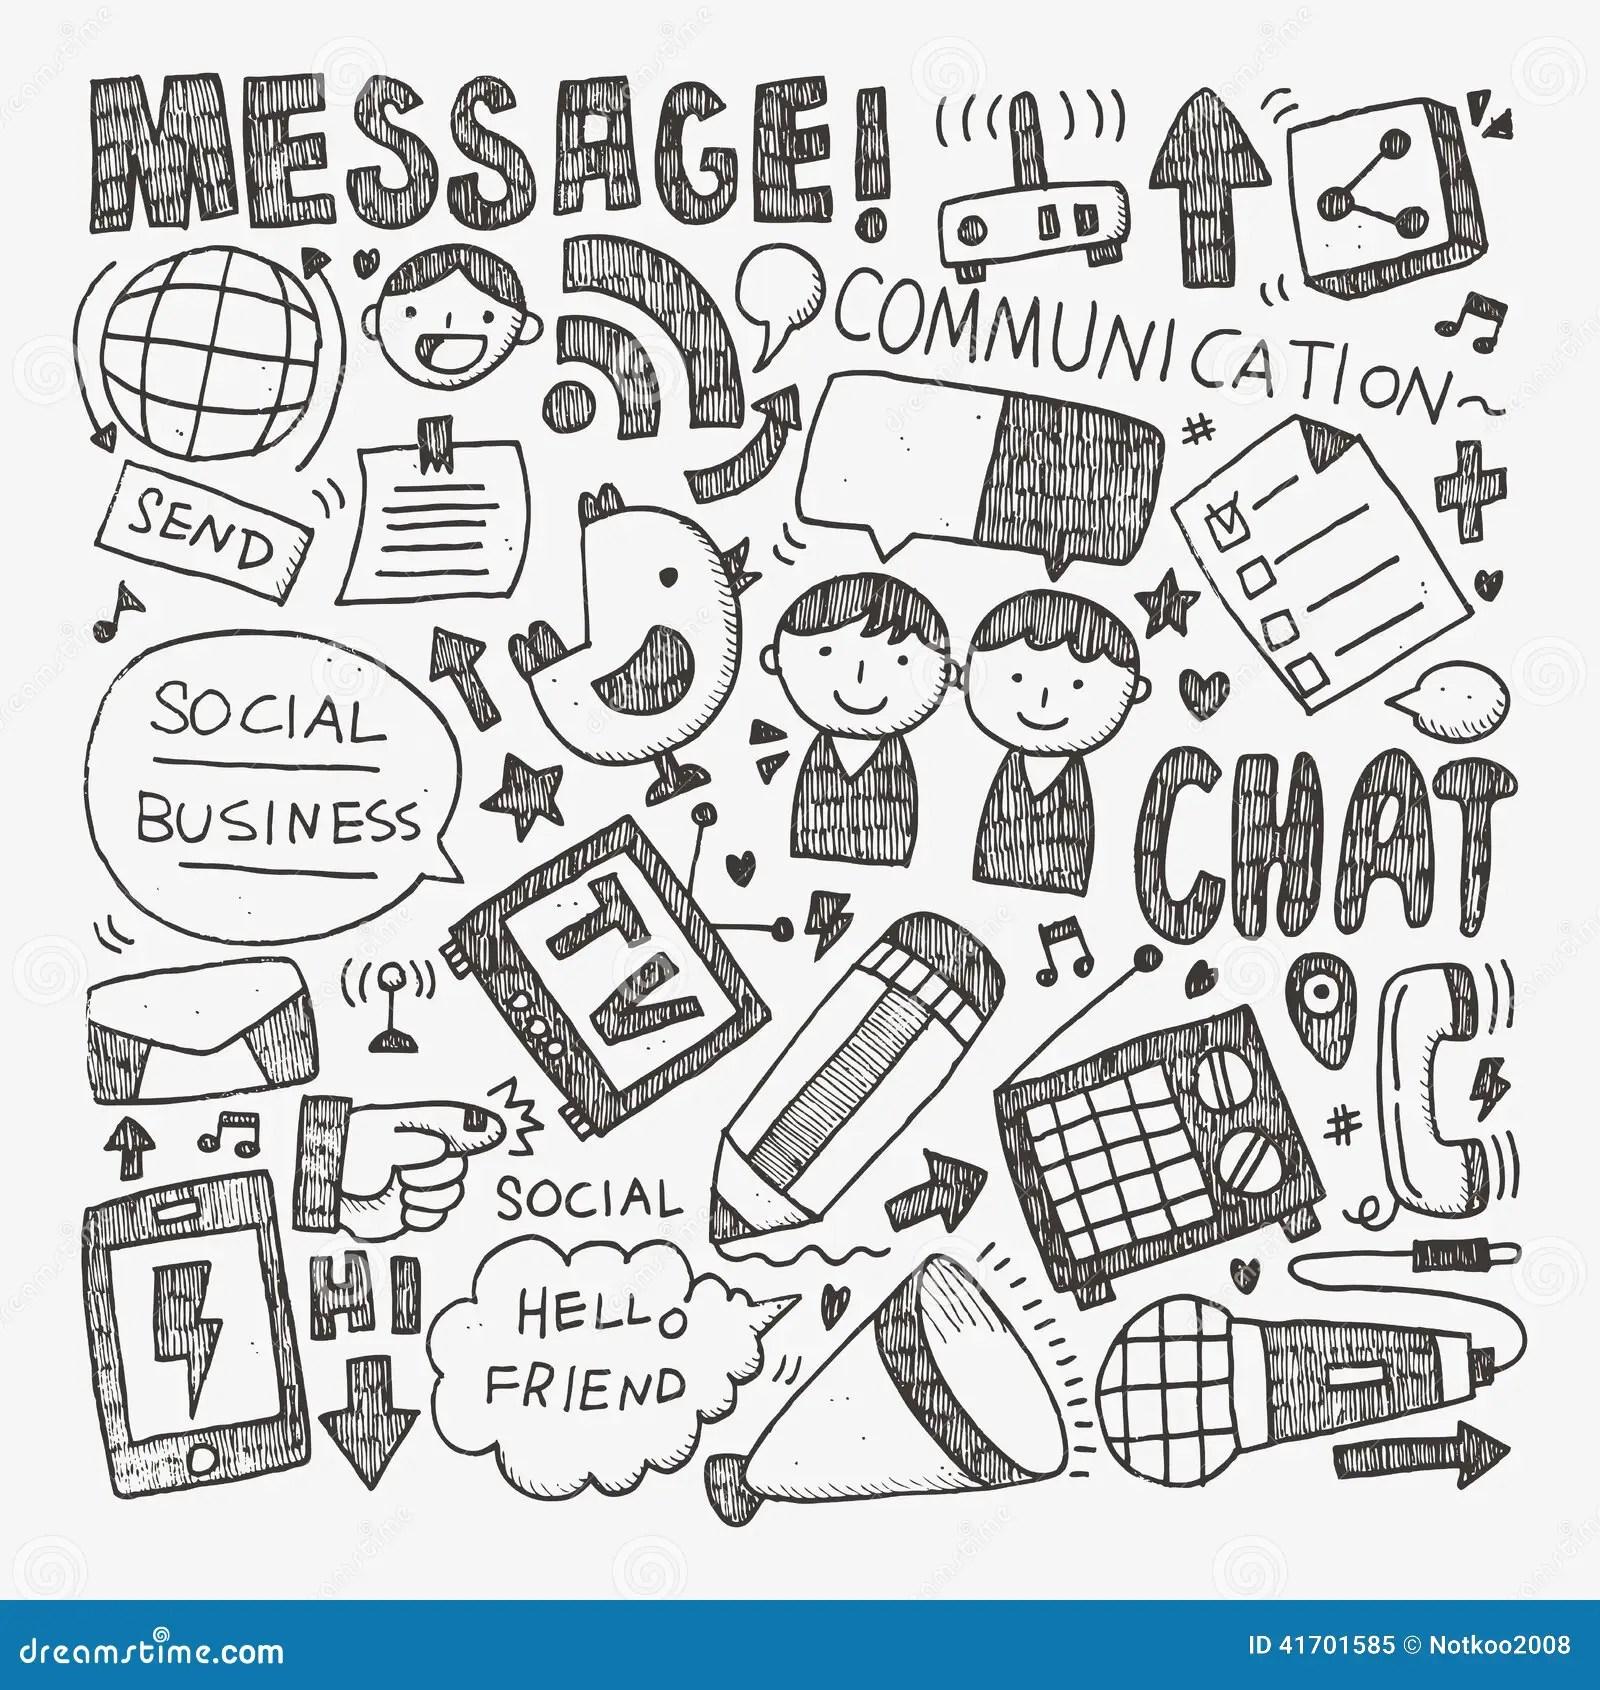 Doodle Communication Background Vector Illustration